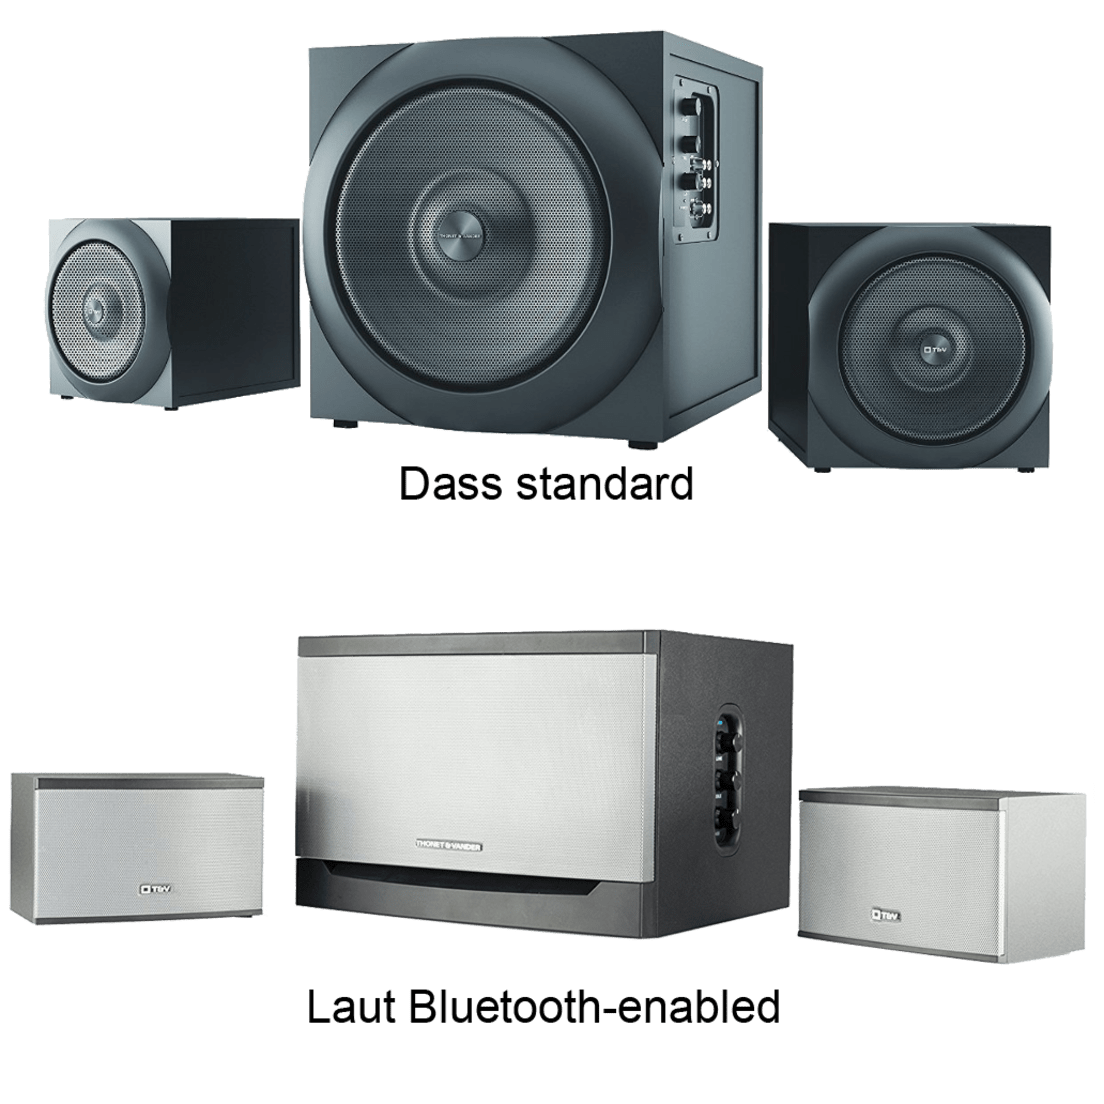 Thonet Vander Dass Laut 21 Speaker Systems Ampamp Kurbis